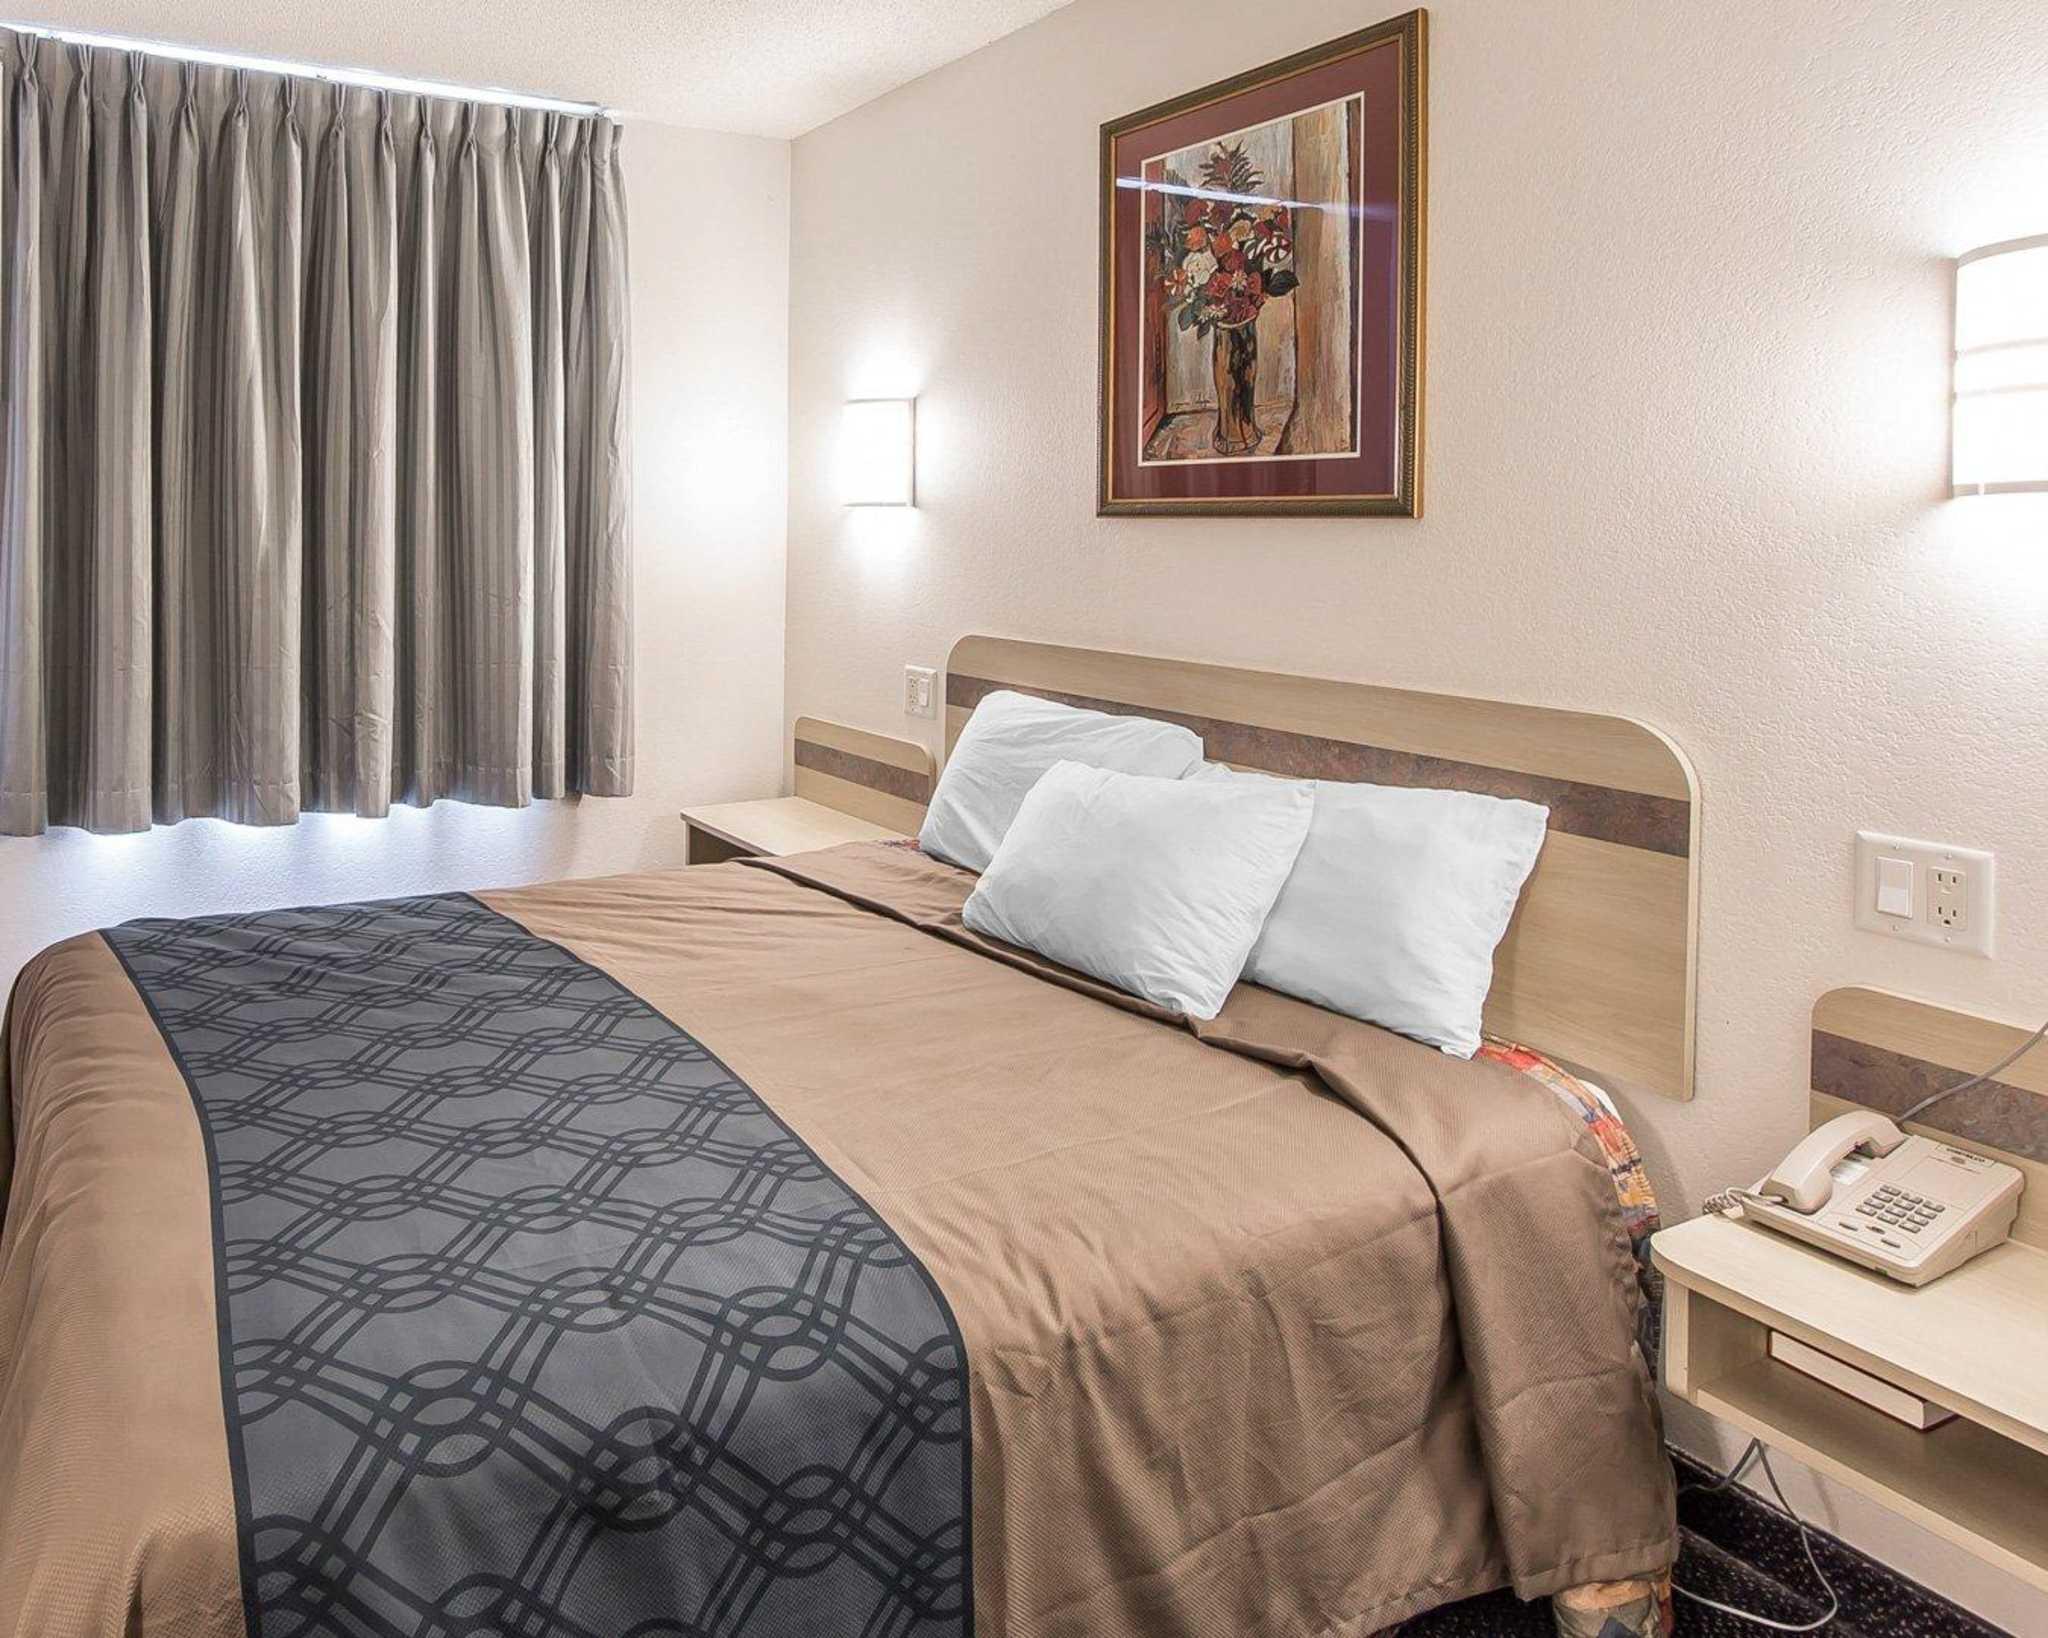 Econo Lodge image 15